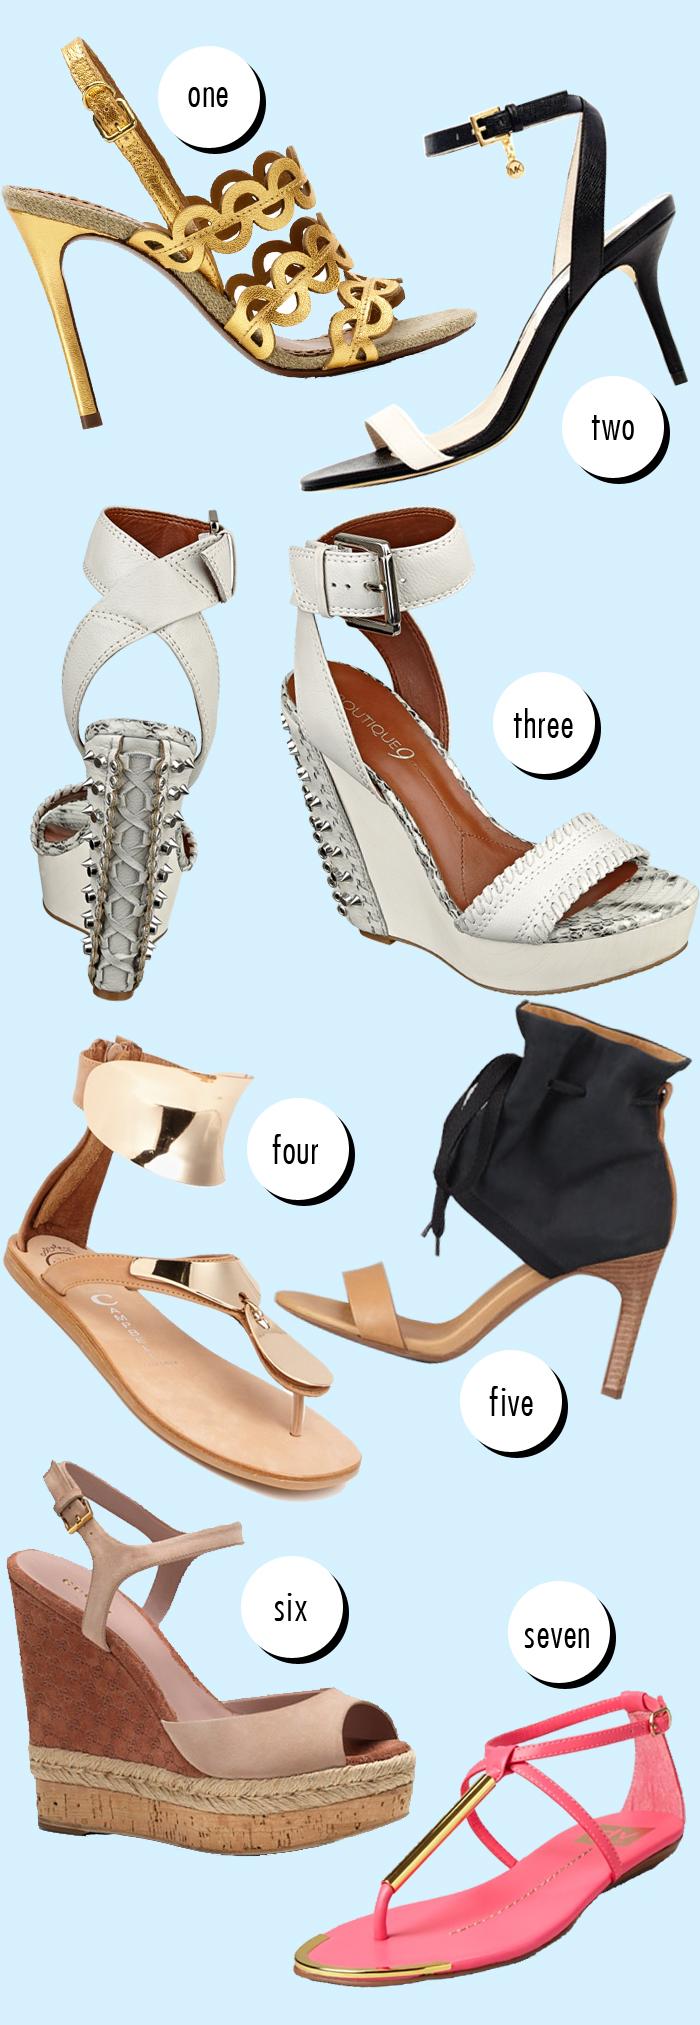 Stylish Summer Sandals